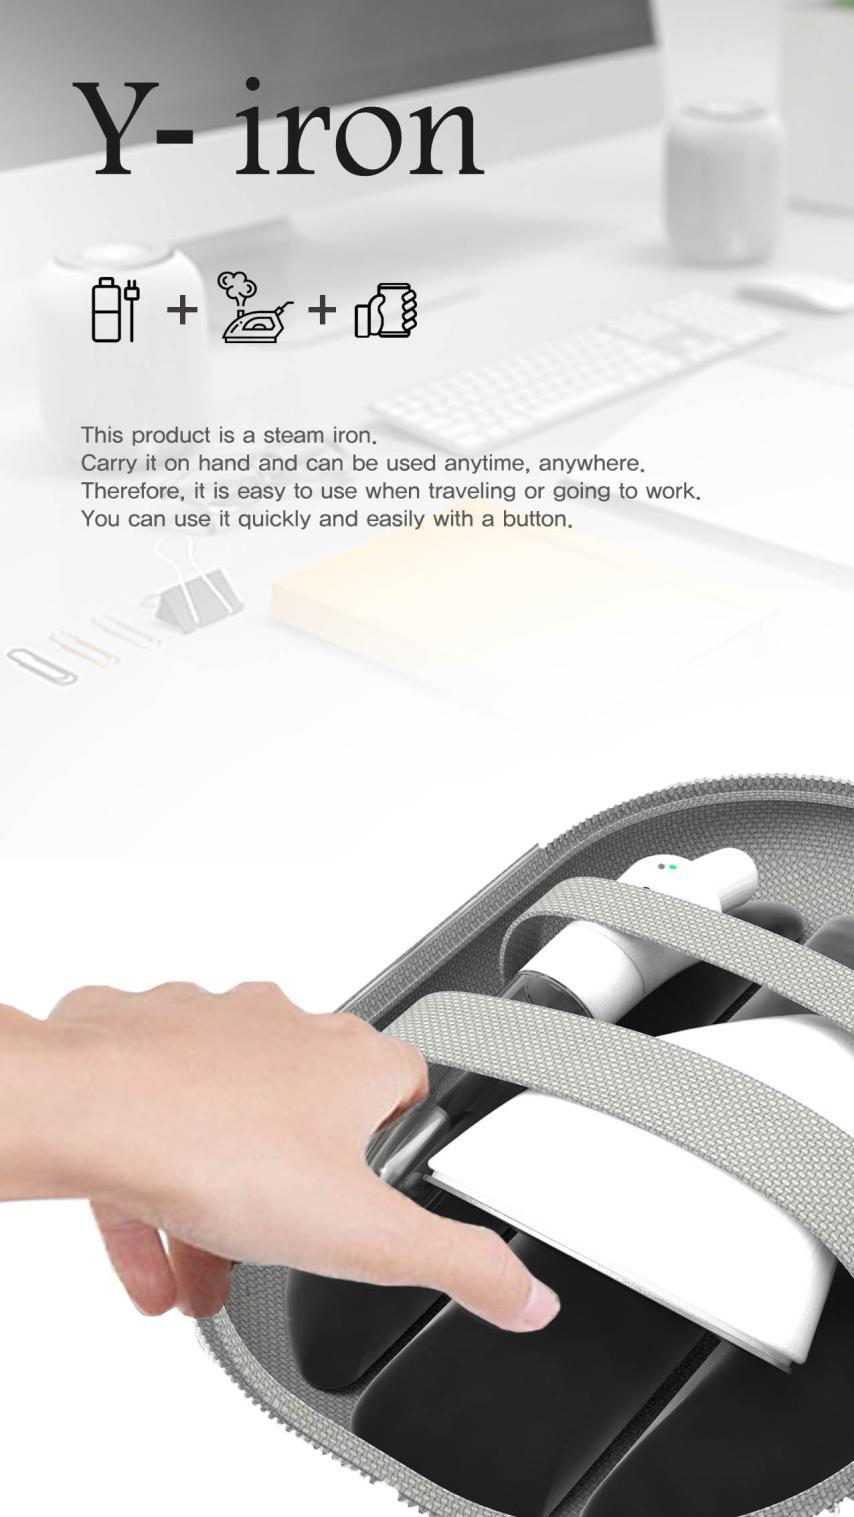 Y steam iron [portable] 202101/36312/AJvXAnkKAAd6N202101041019155.jpg